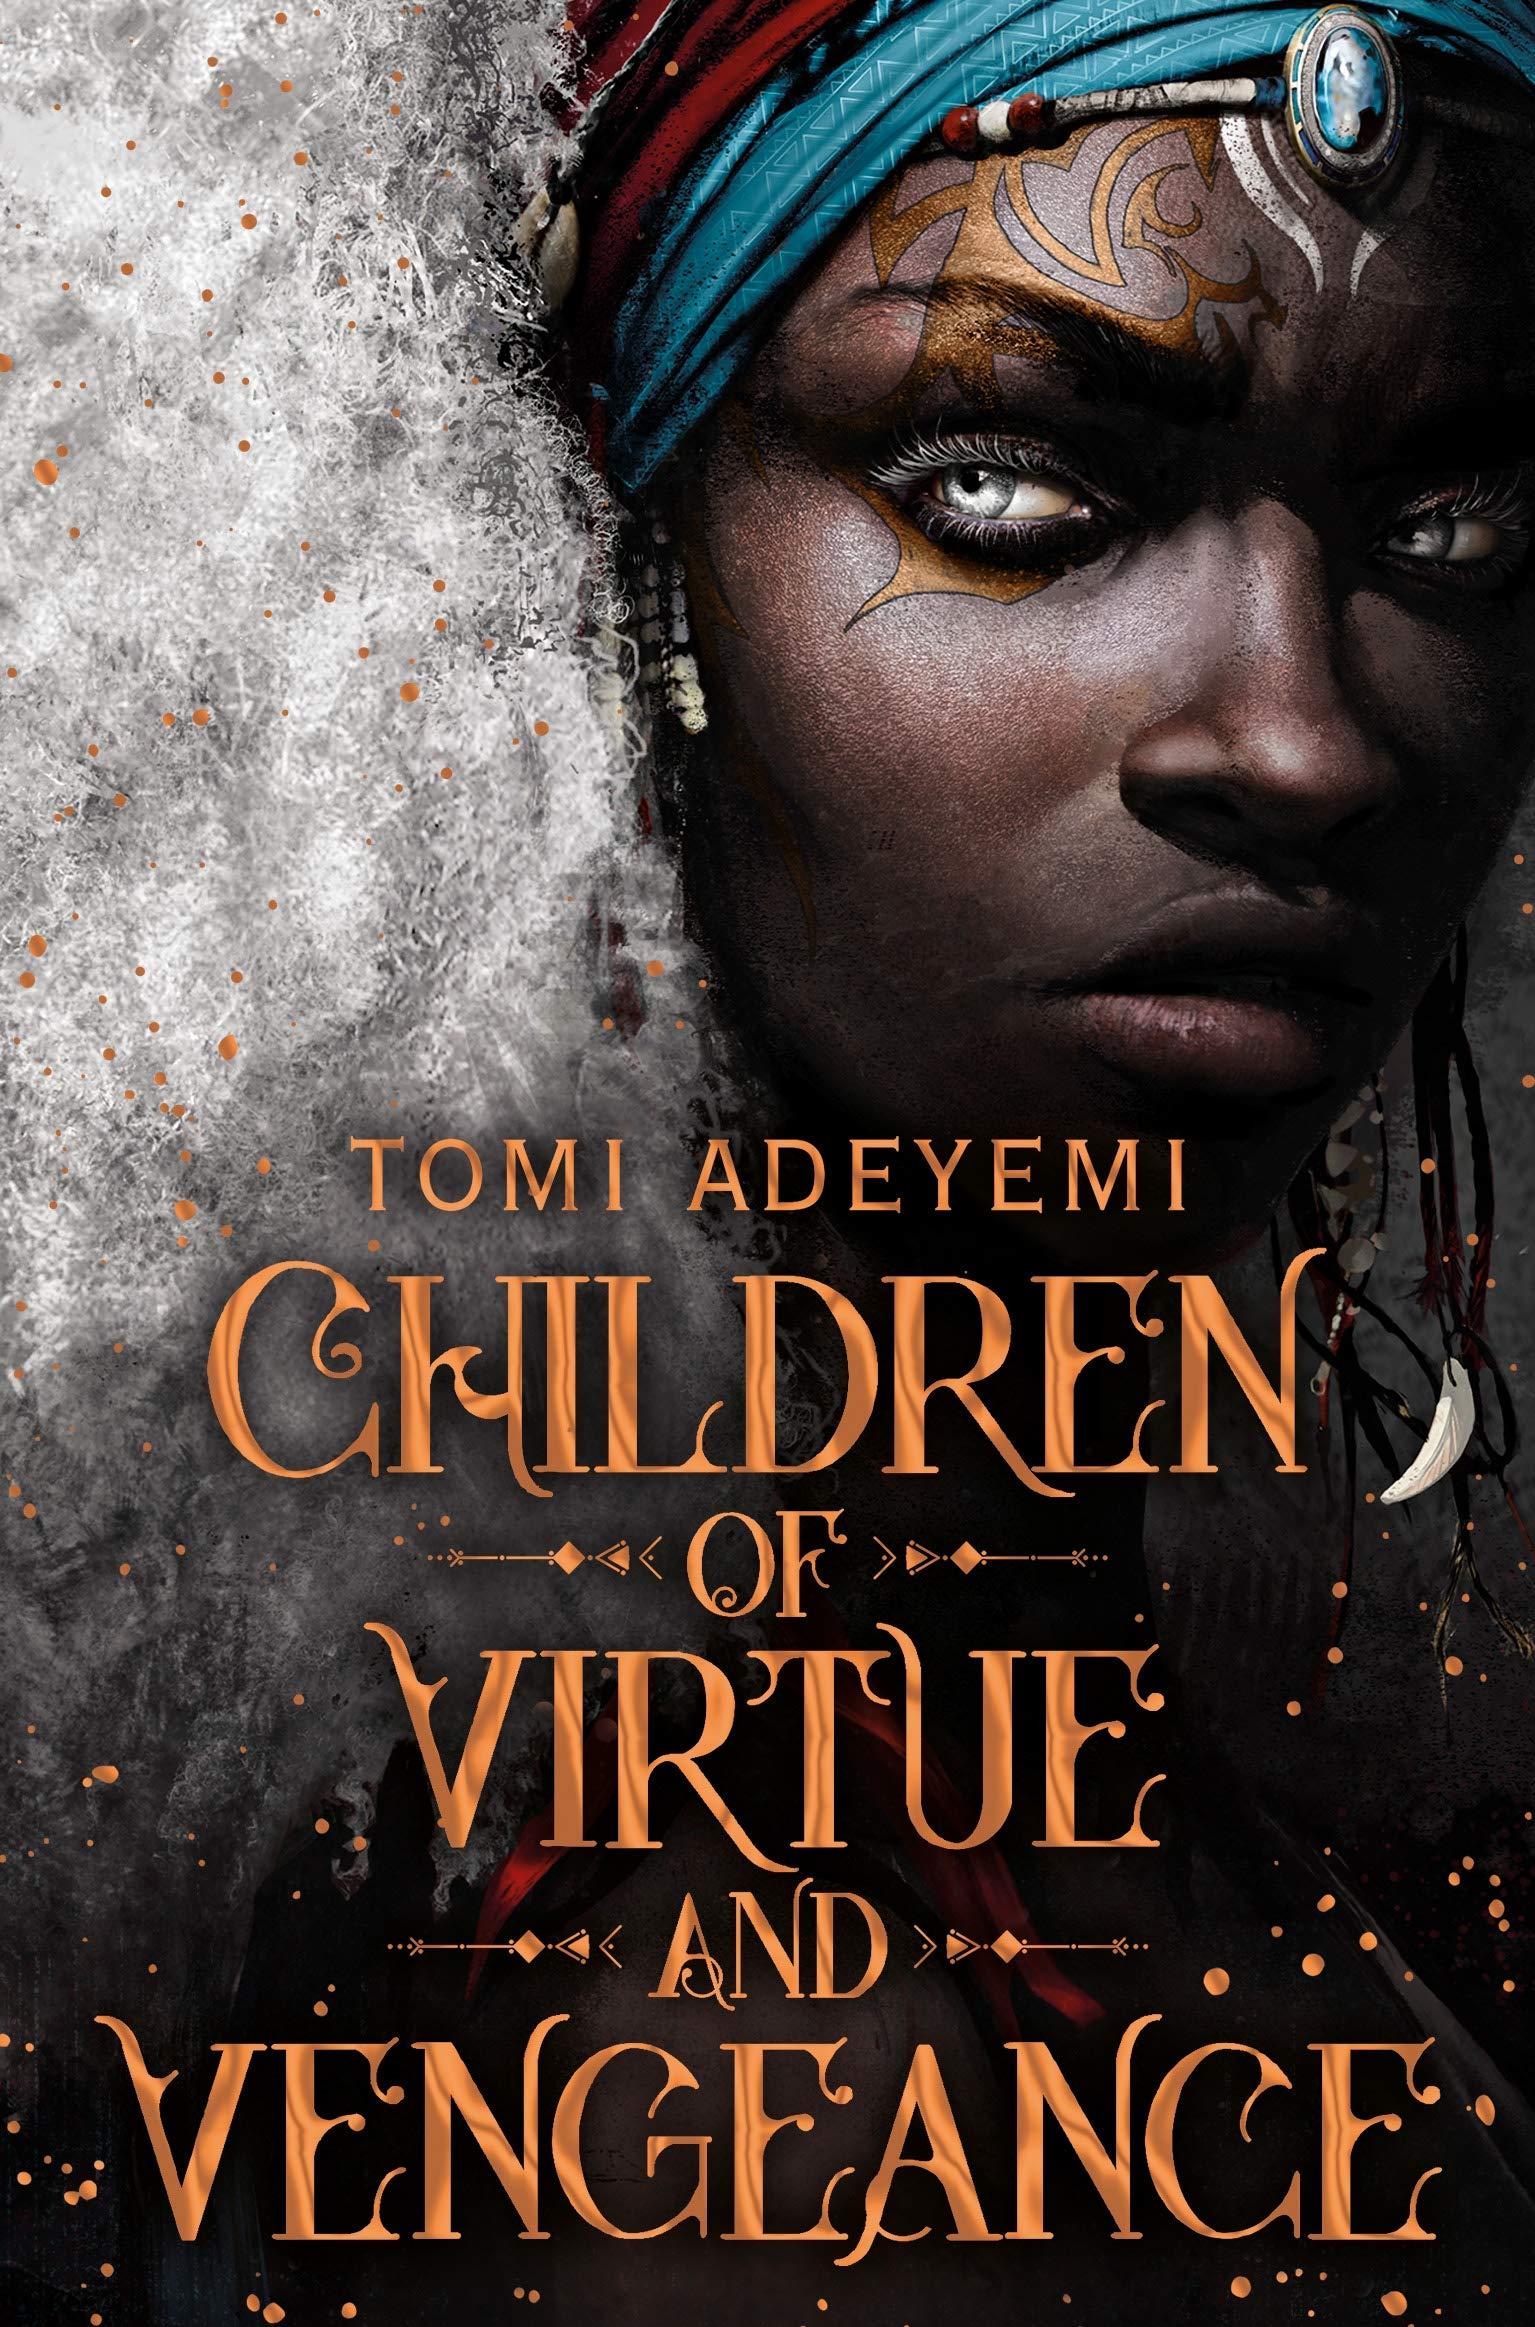 "Image result for children of virtue and vengeance"""